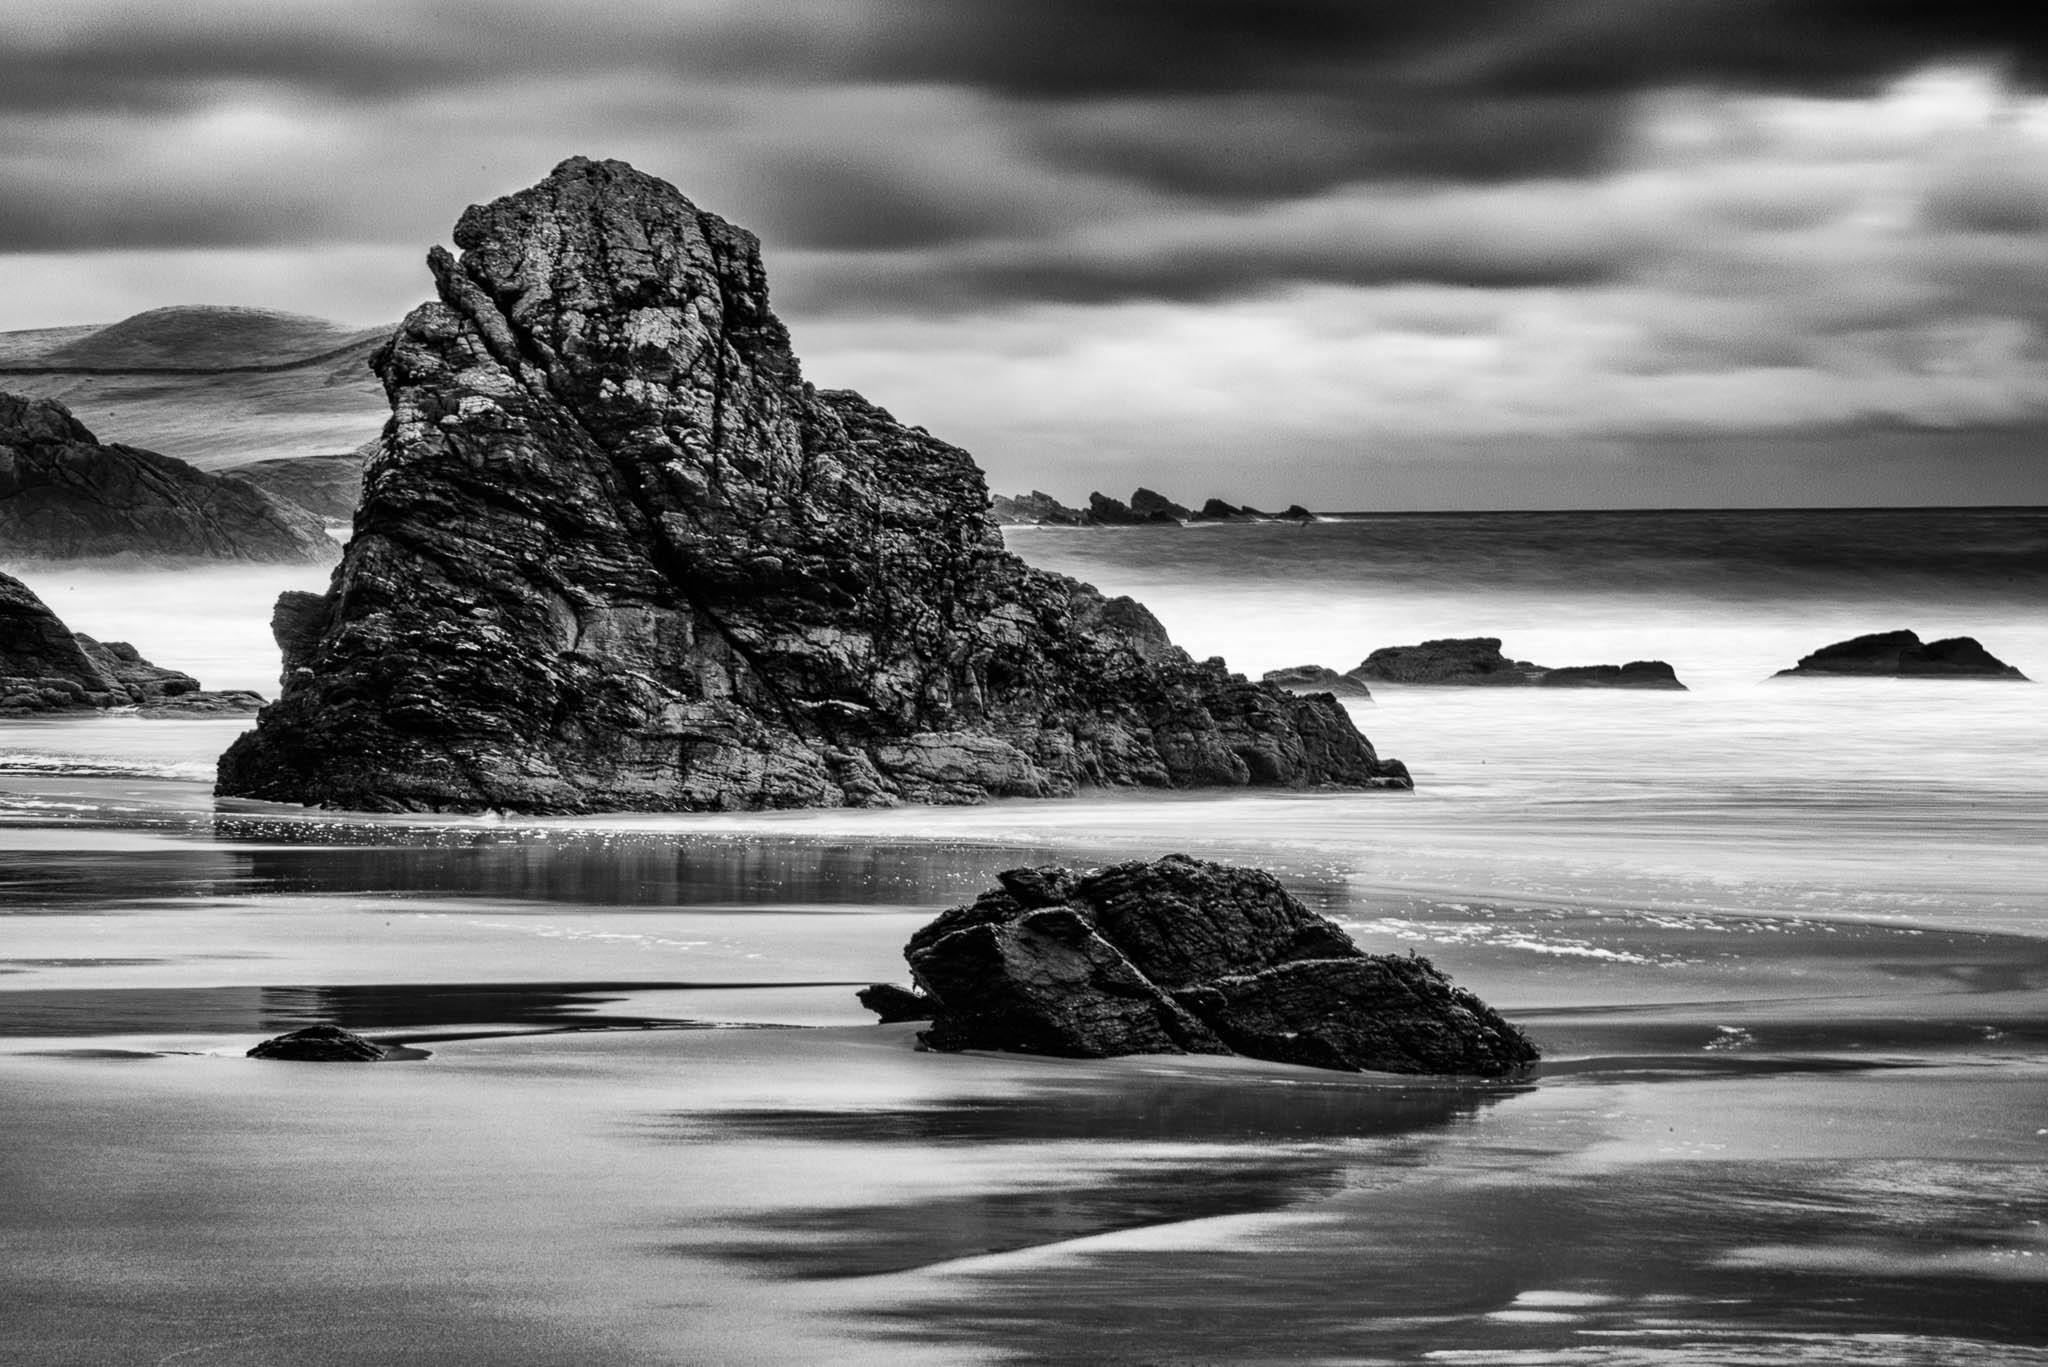 Sango Sands Bay, United Kingdom